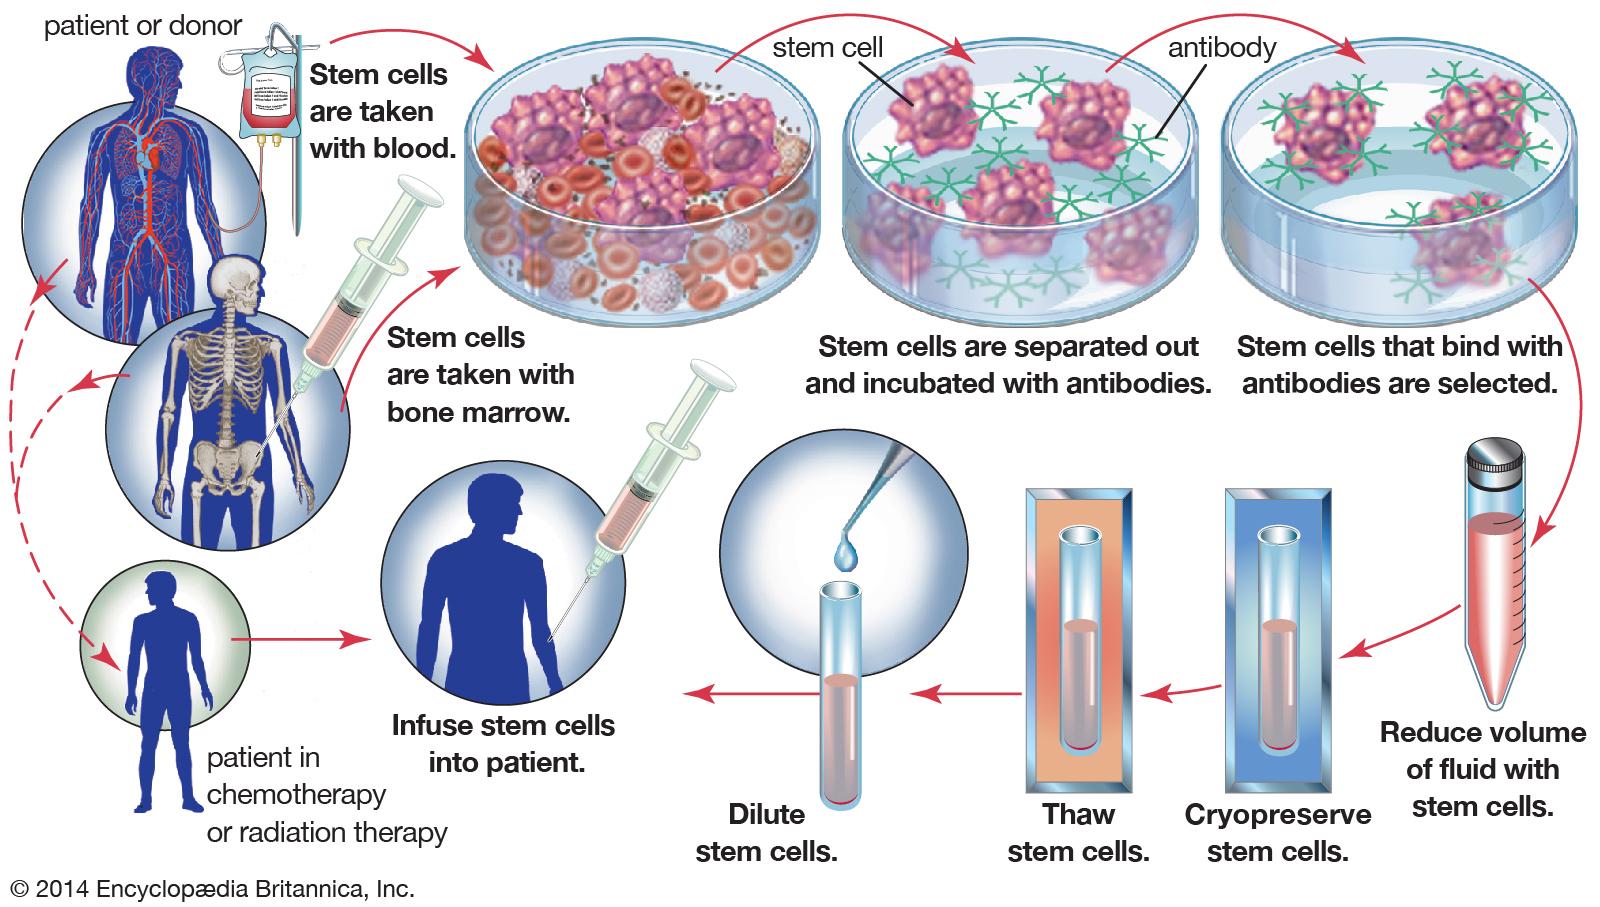 bone-marrow-stem-cells-cancer-radiation-chemotherapy.jpg